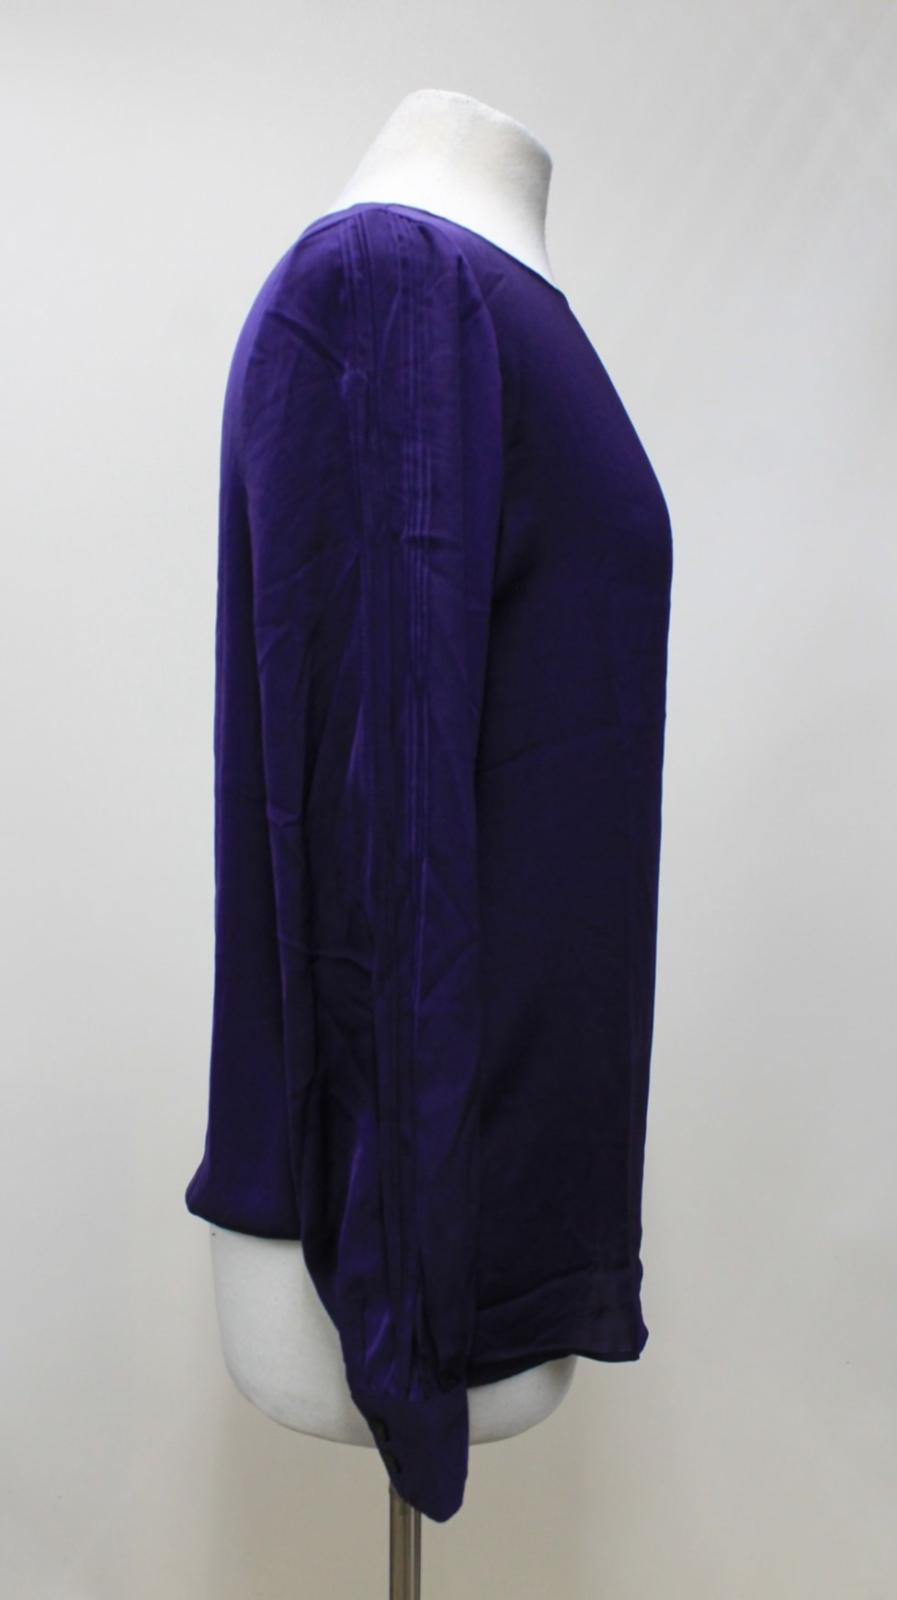 LAUREN-BY-RALPH-LAUREN-Ladies-Purple-Satin-Pleated-Sleeve-Round-Neck-Top-S thumbnail 4